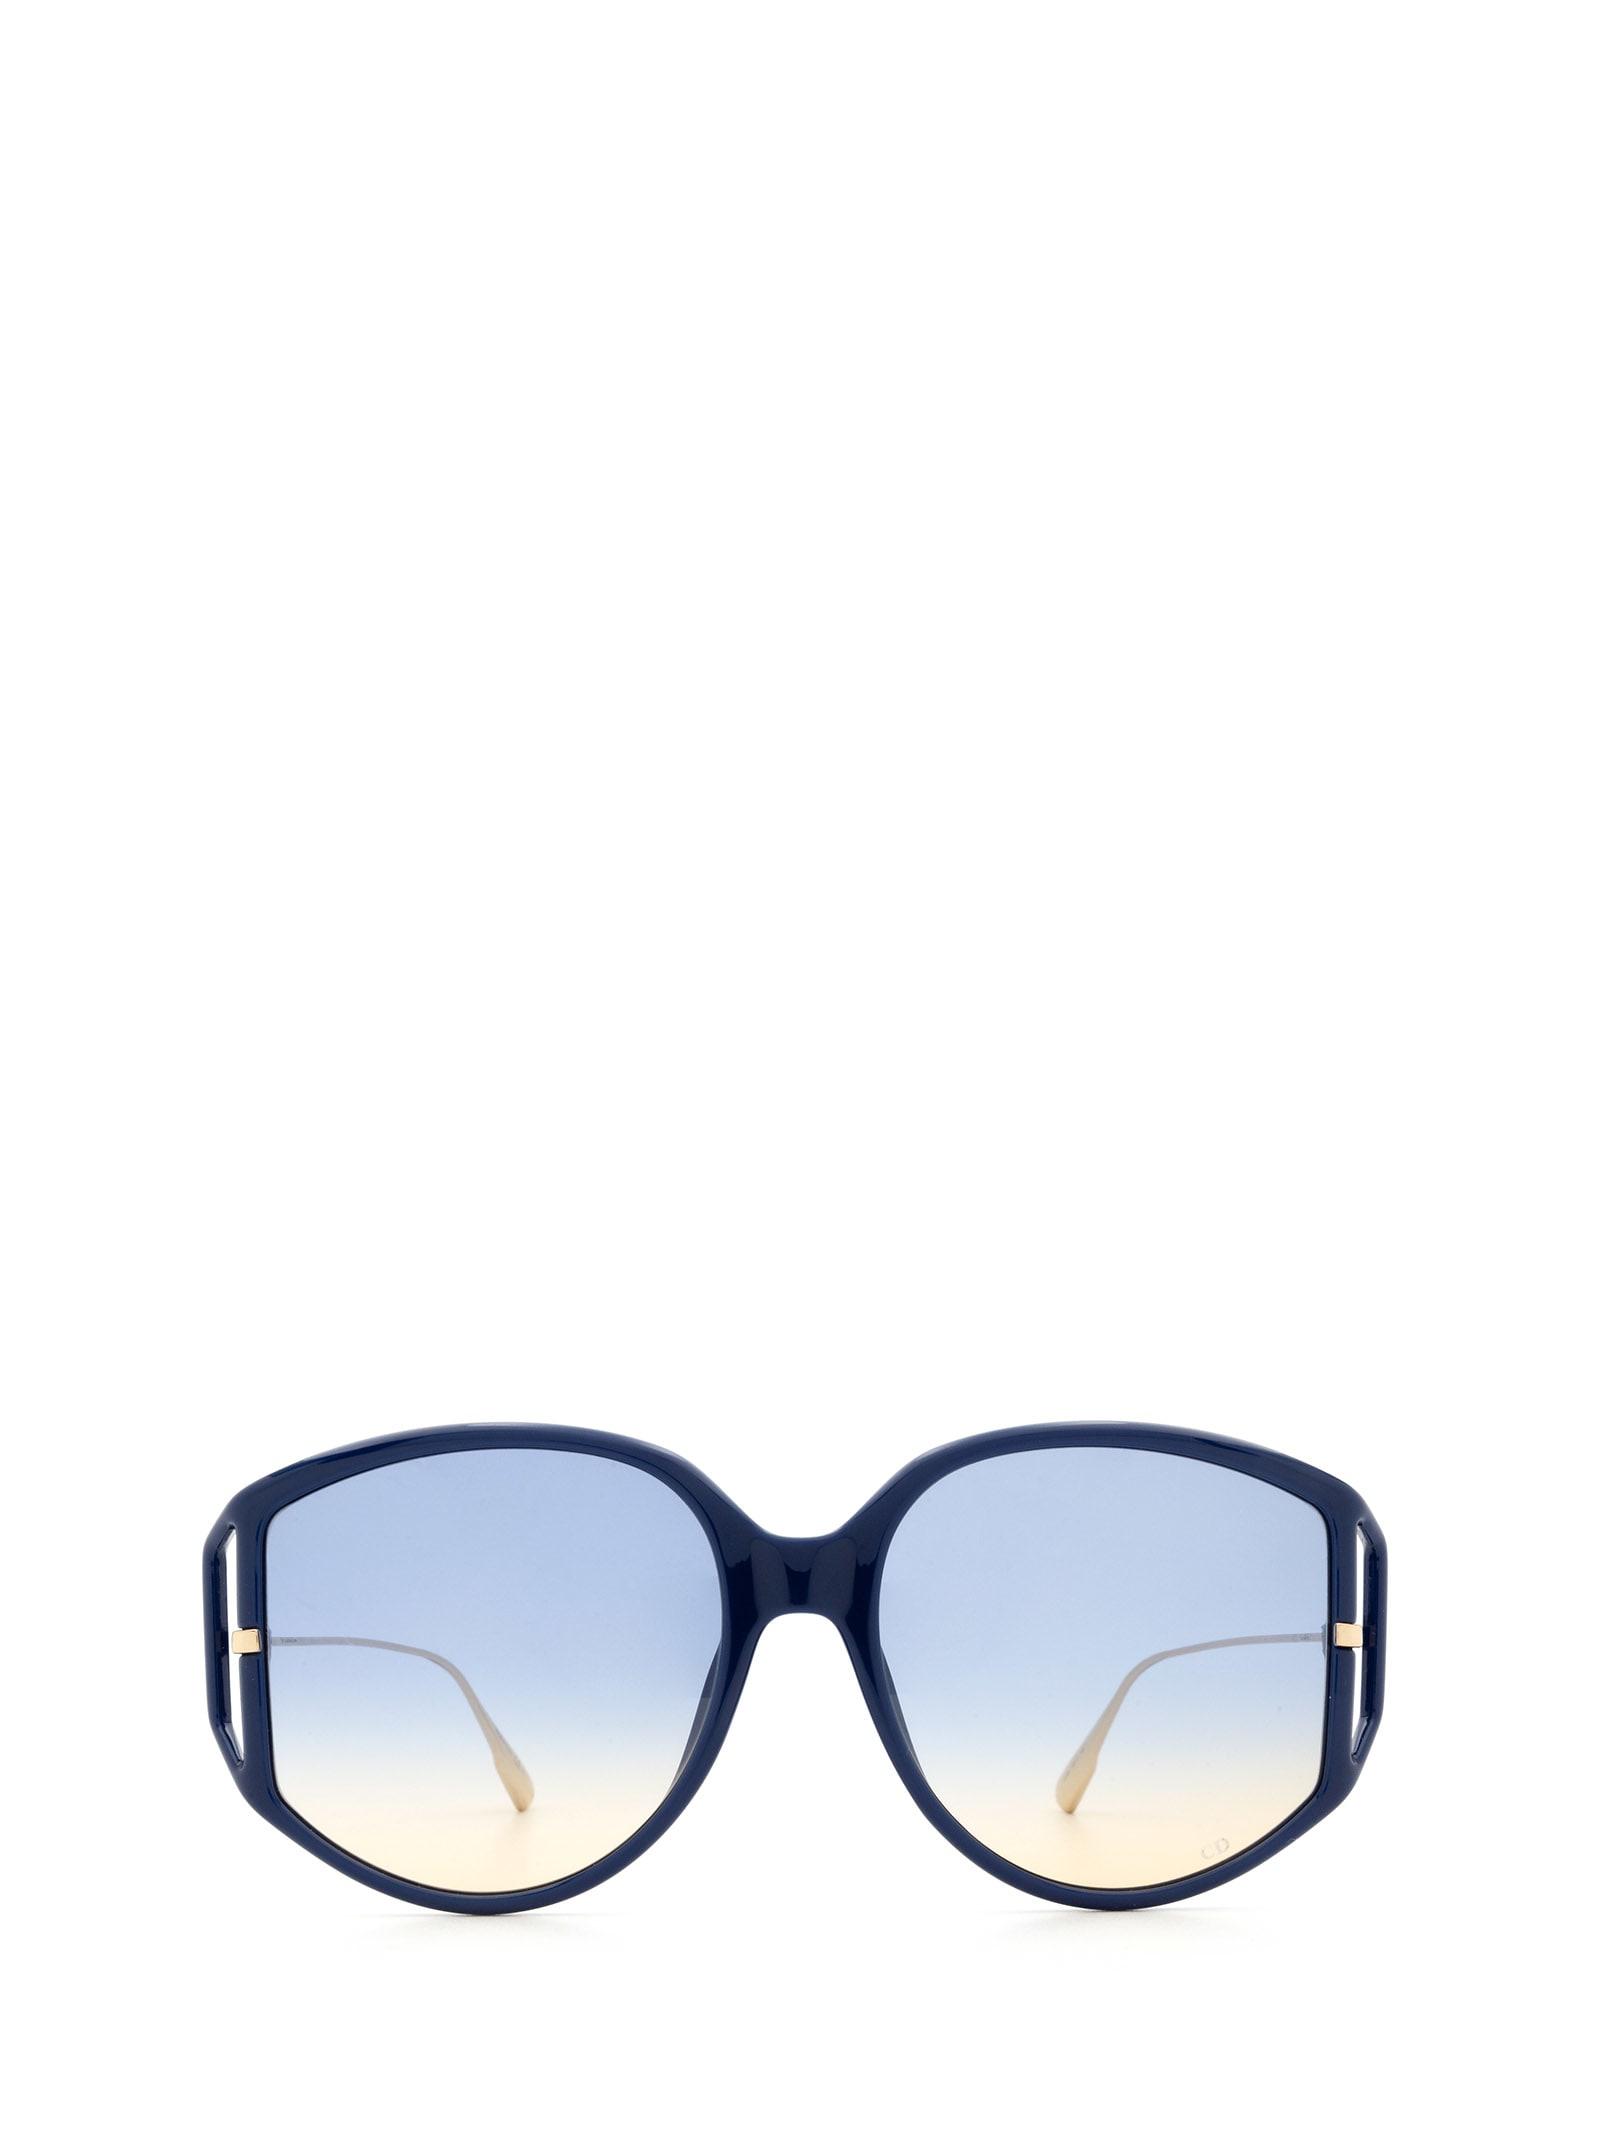 Dior DIRECTION2 BLUE SUNGLASSES